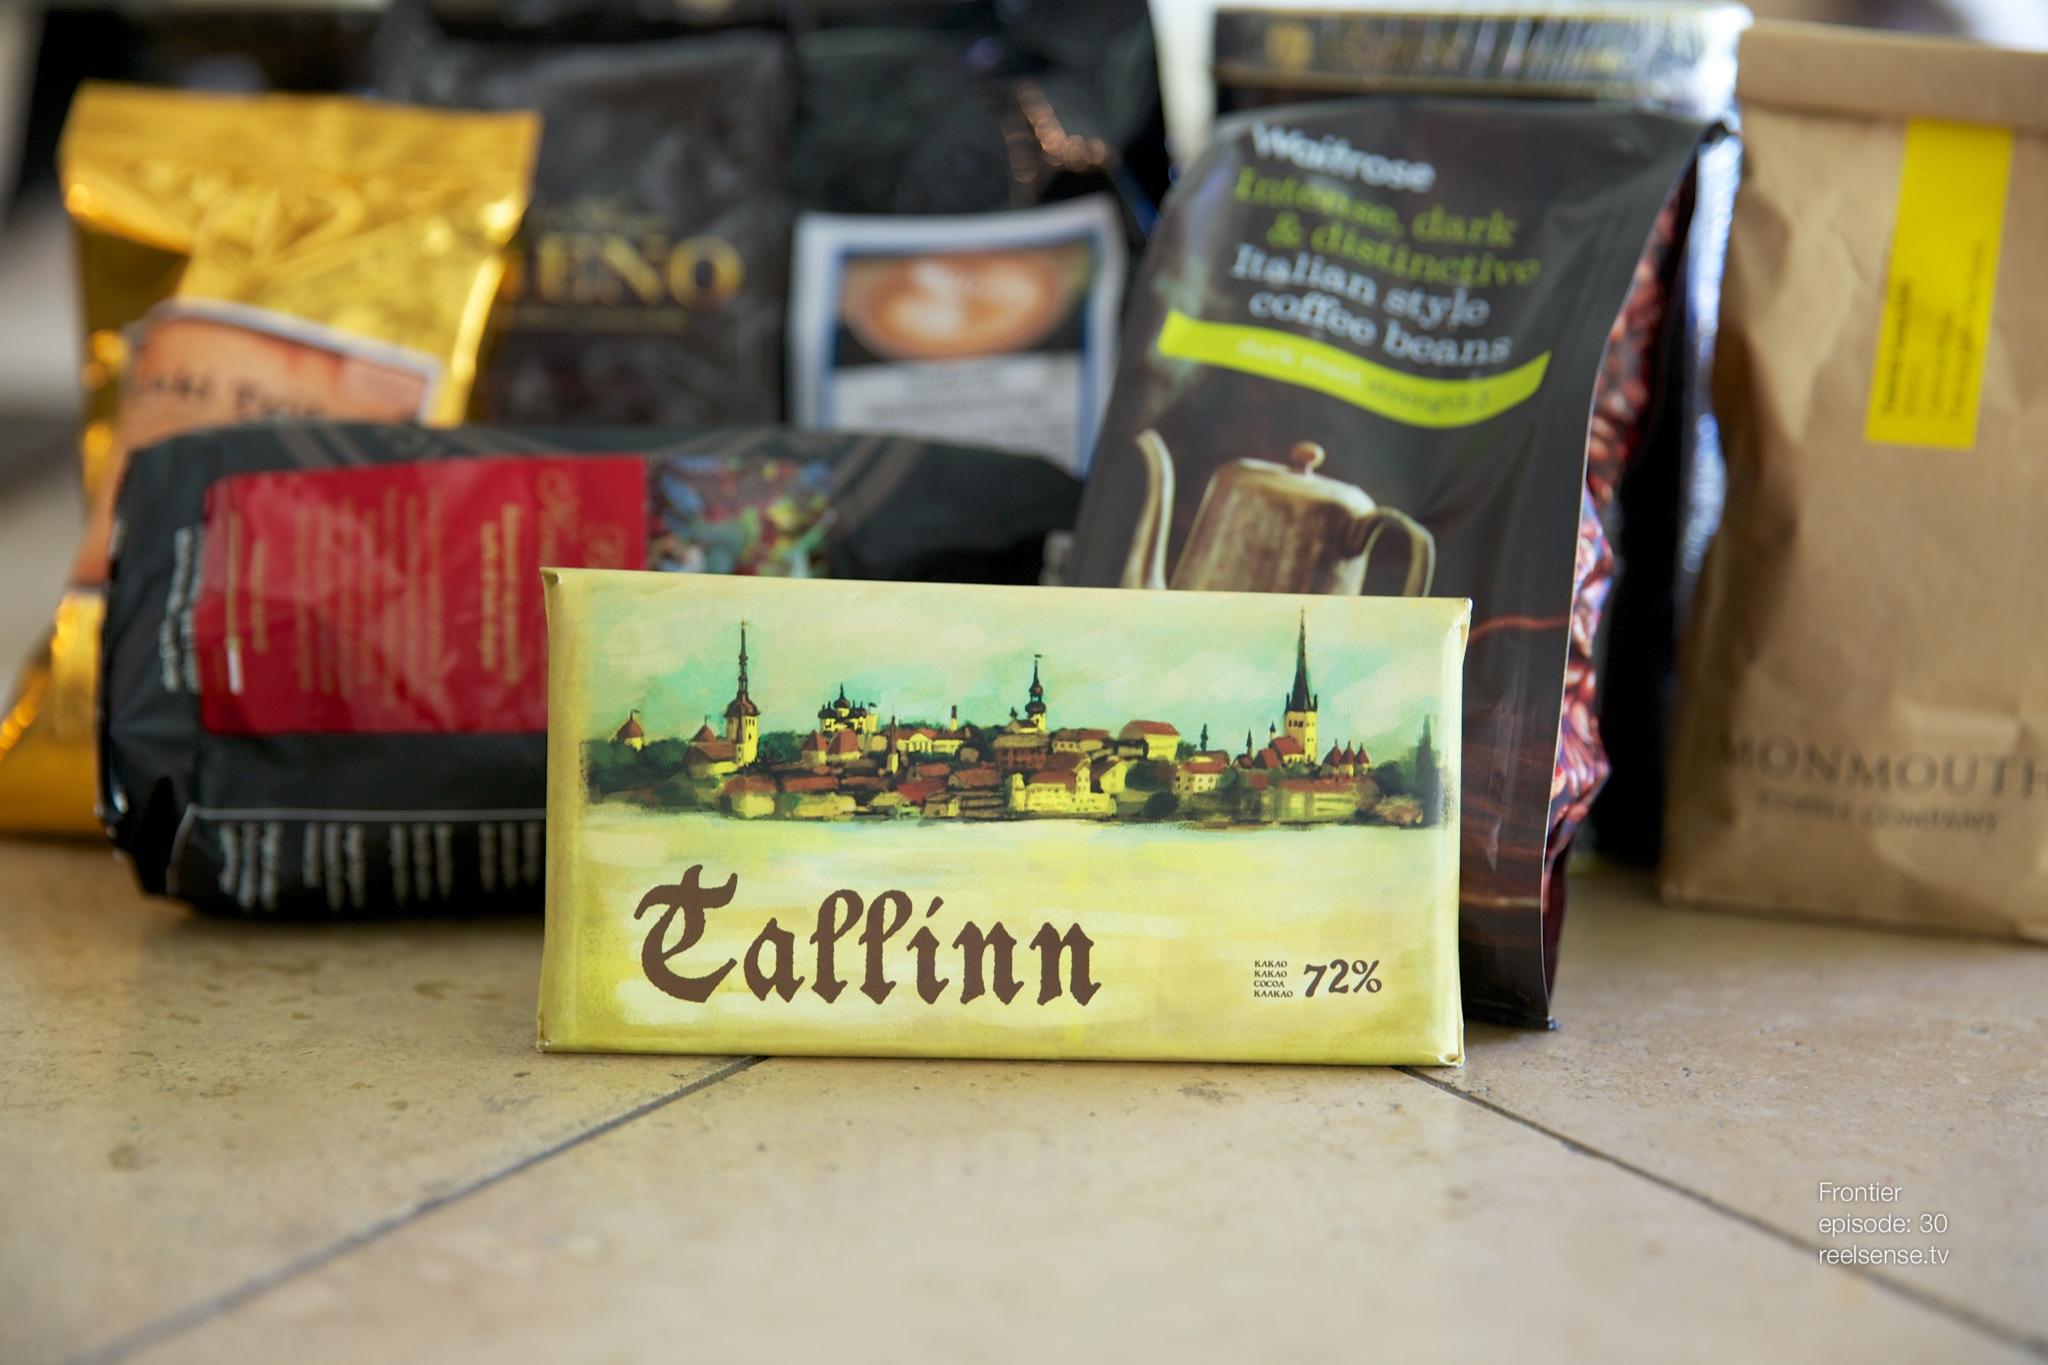 Tallinn 72% Cocoa - Estonia